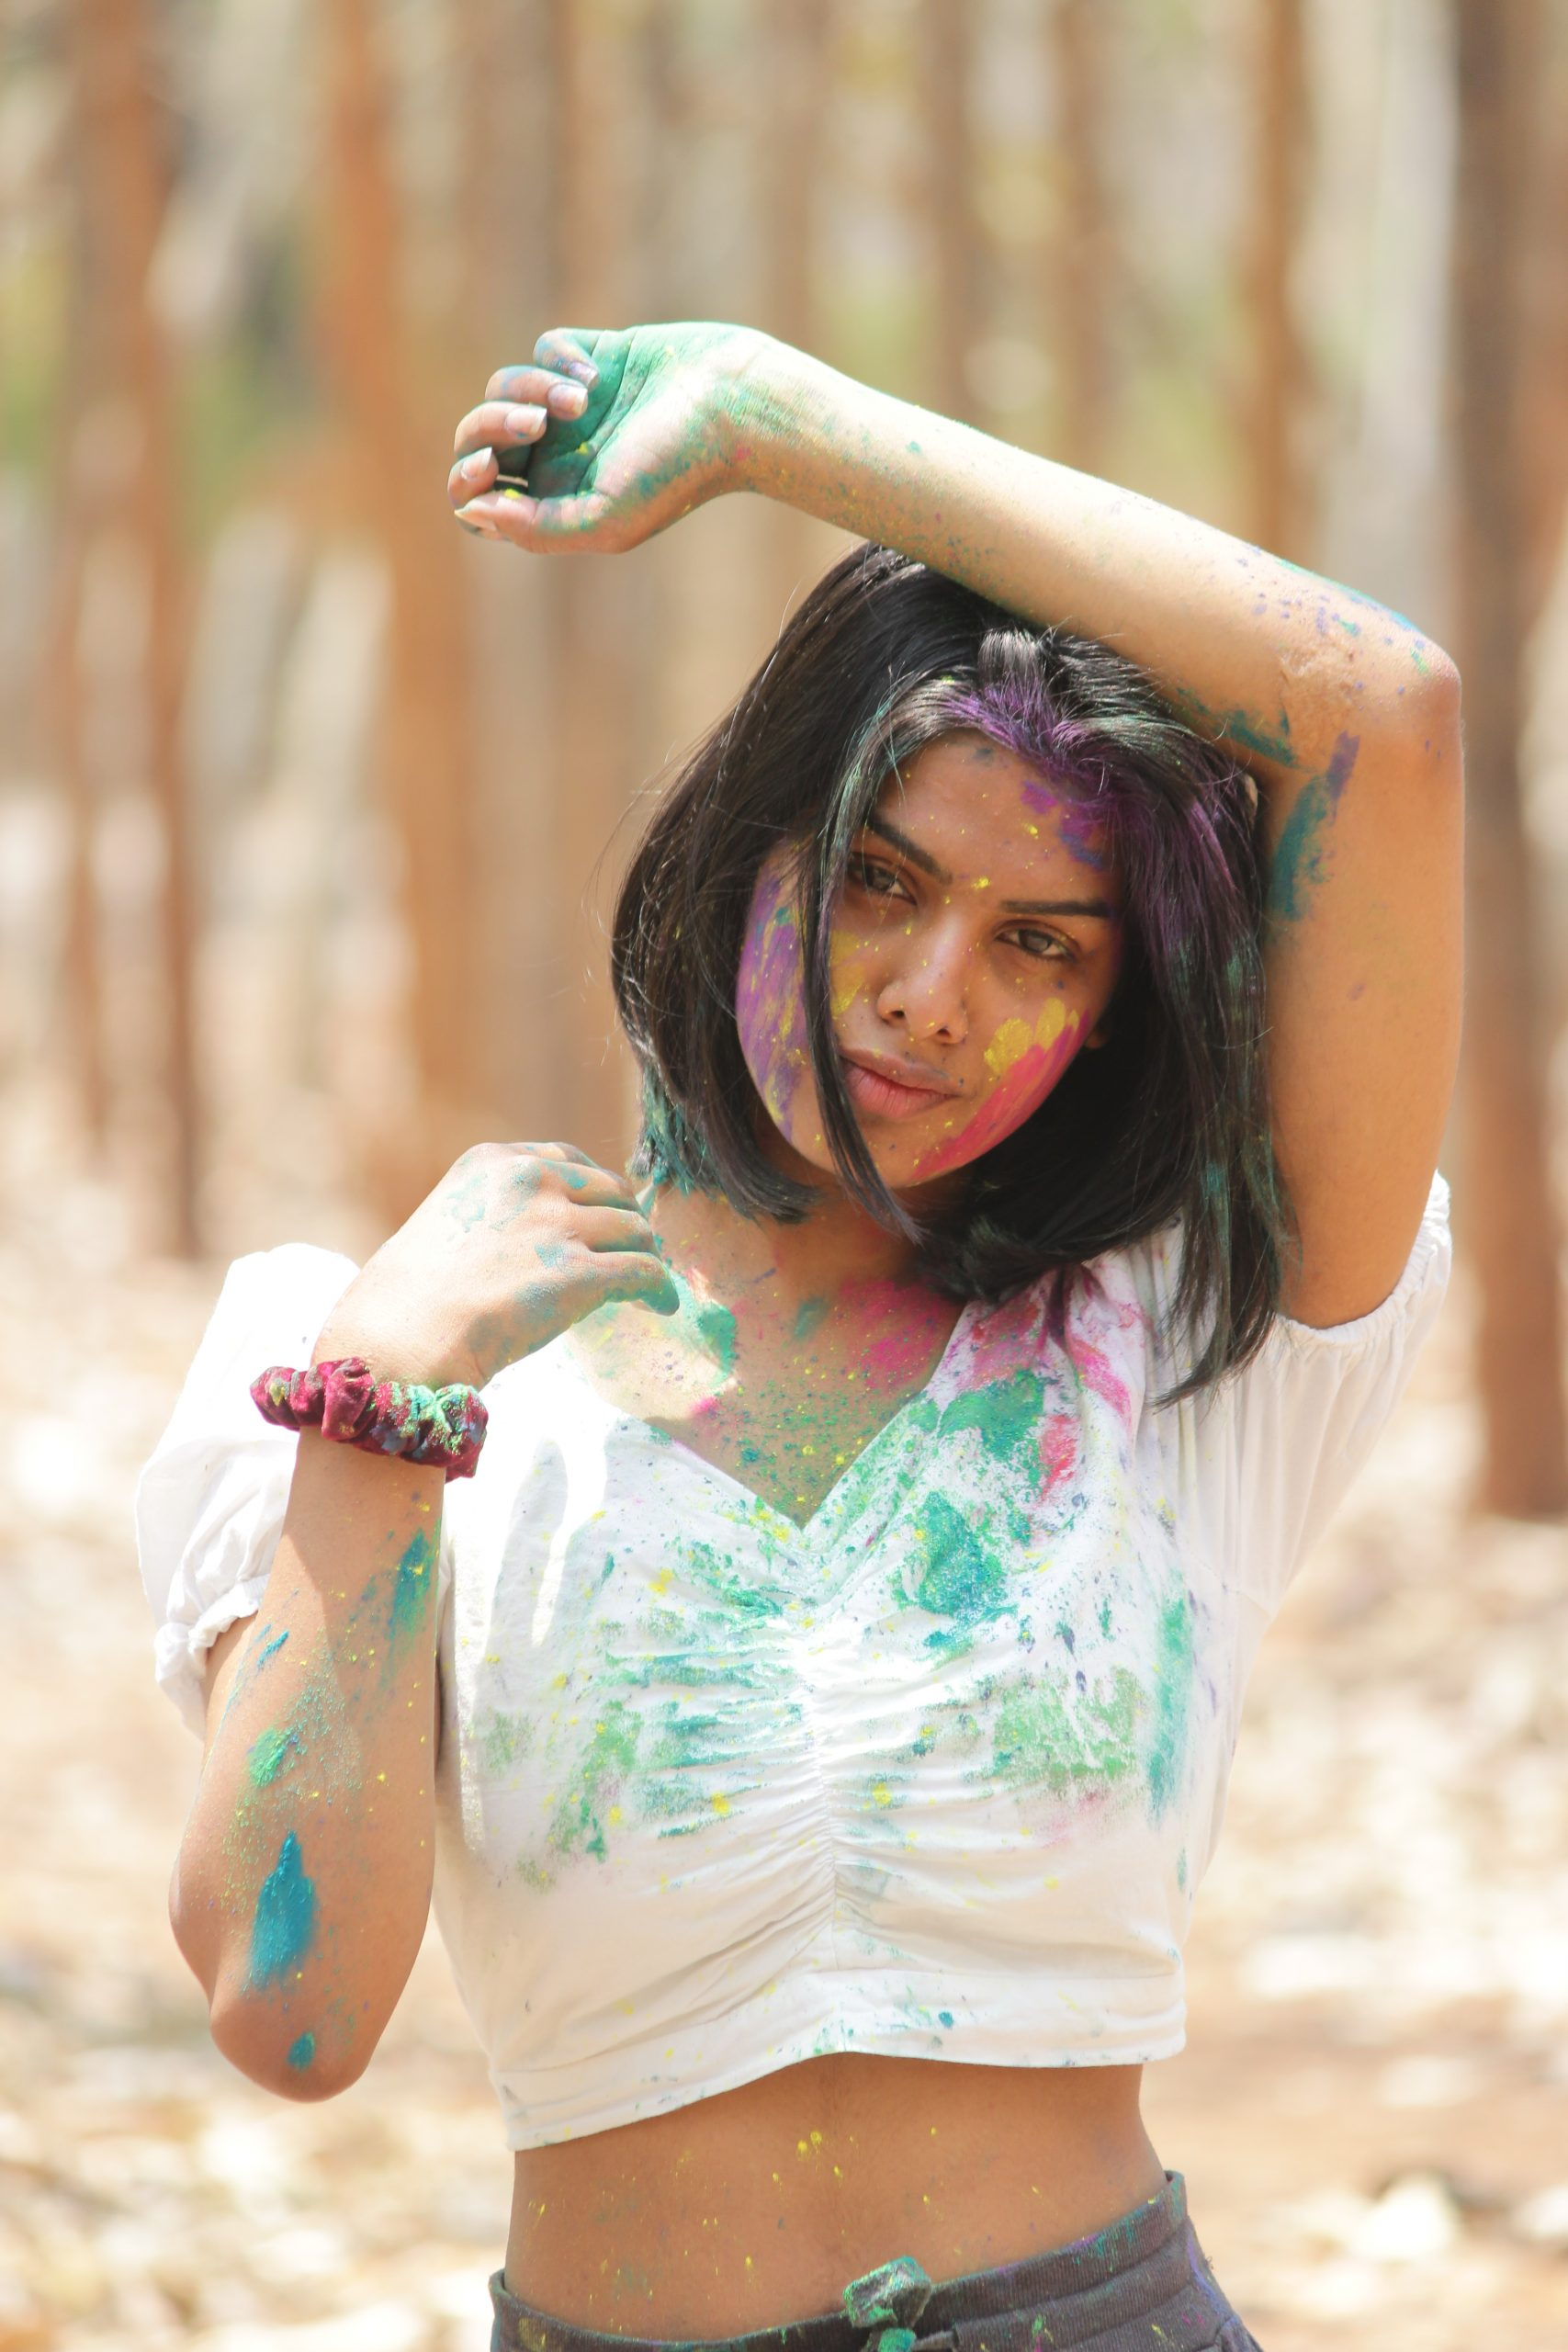 A fashion model celebrating Holi festival